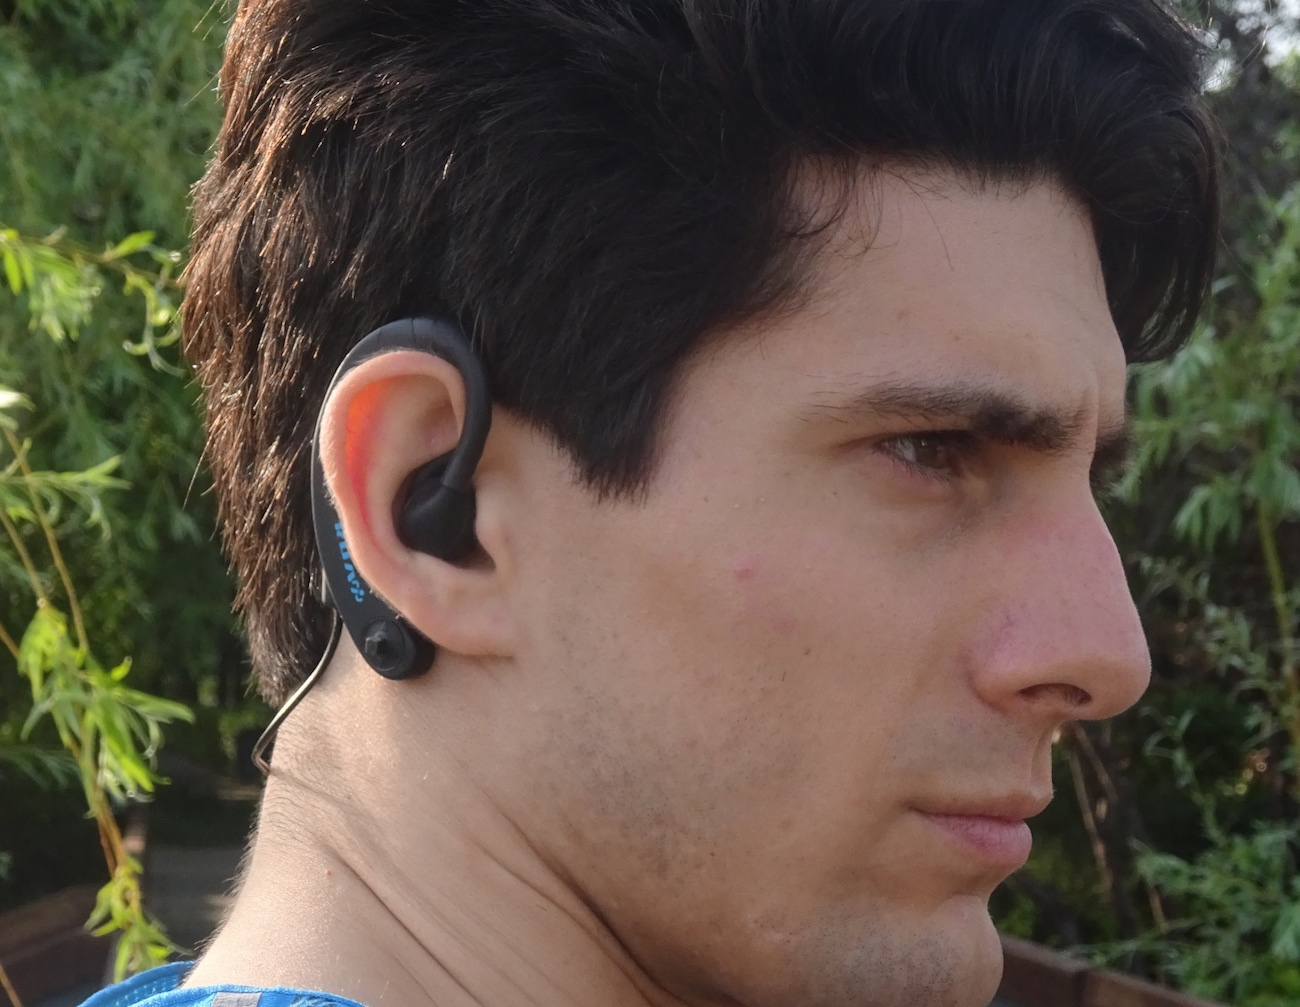 KUAI – The World's First Wearable Coach Headphones